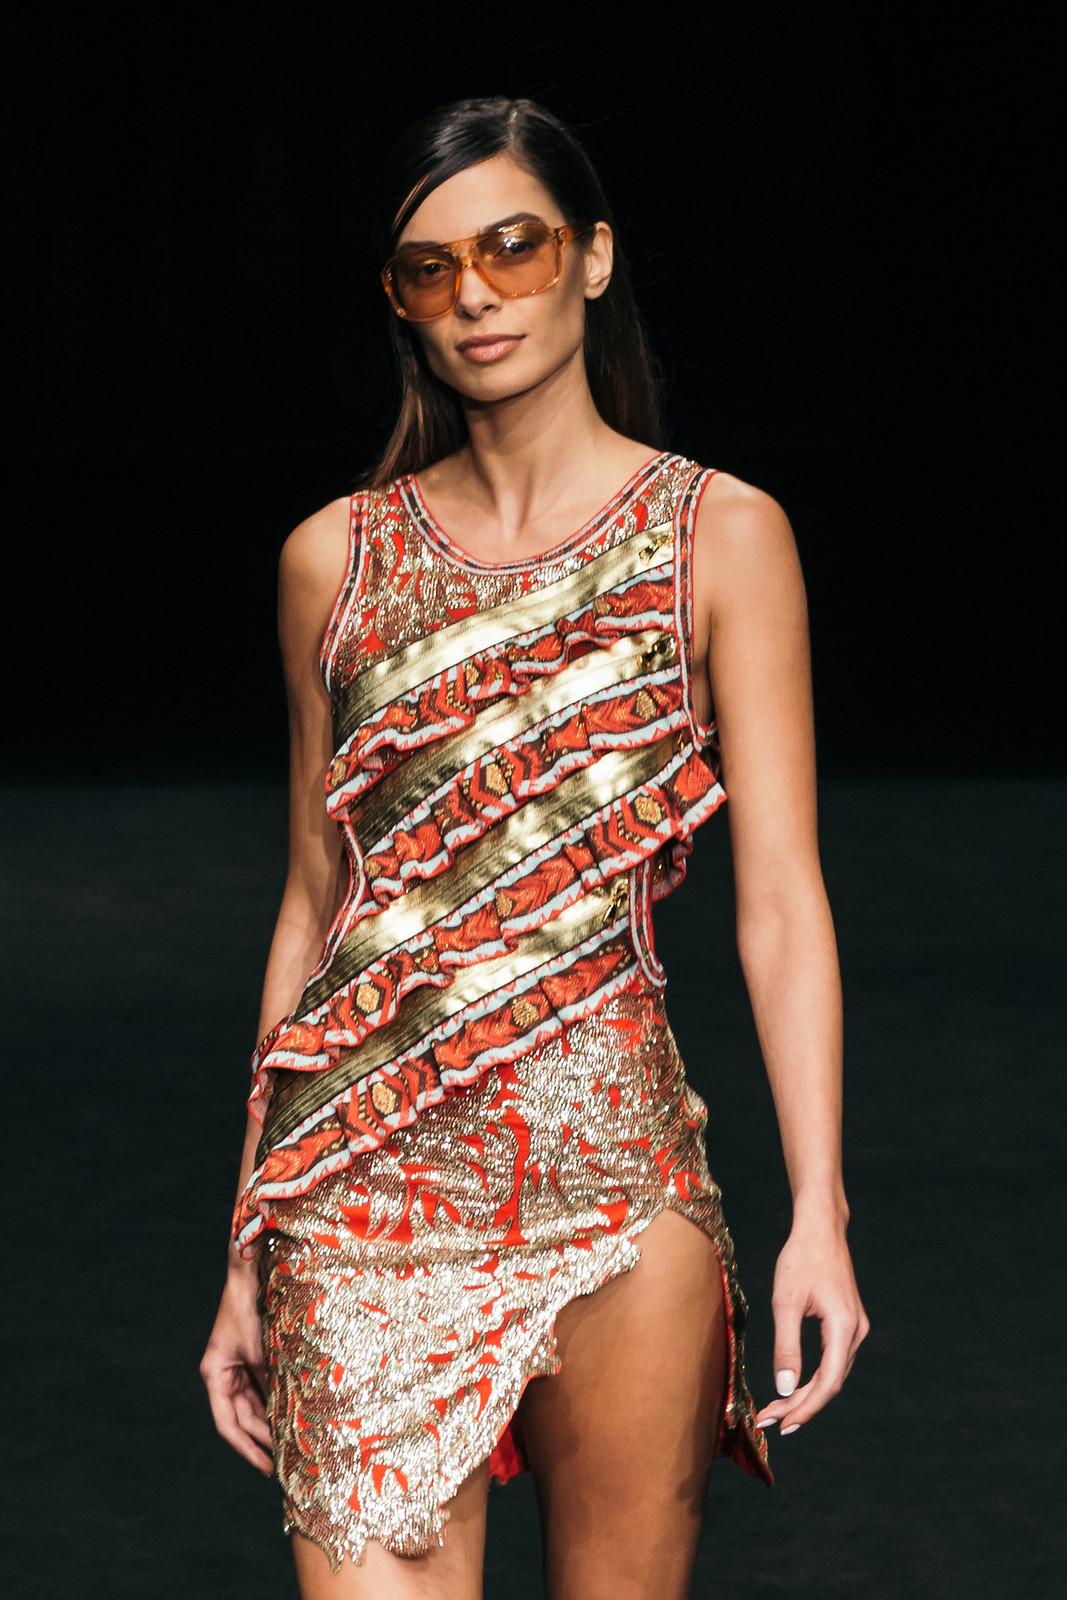 Jessie Chanes - Seams for a desire - 080 Bacelona Fashion #080bcnfasion -11